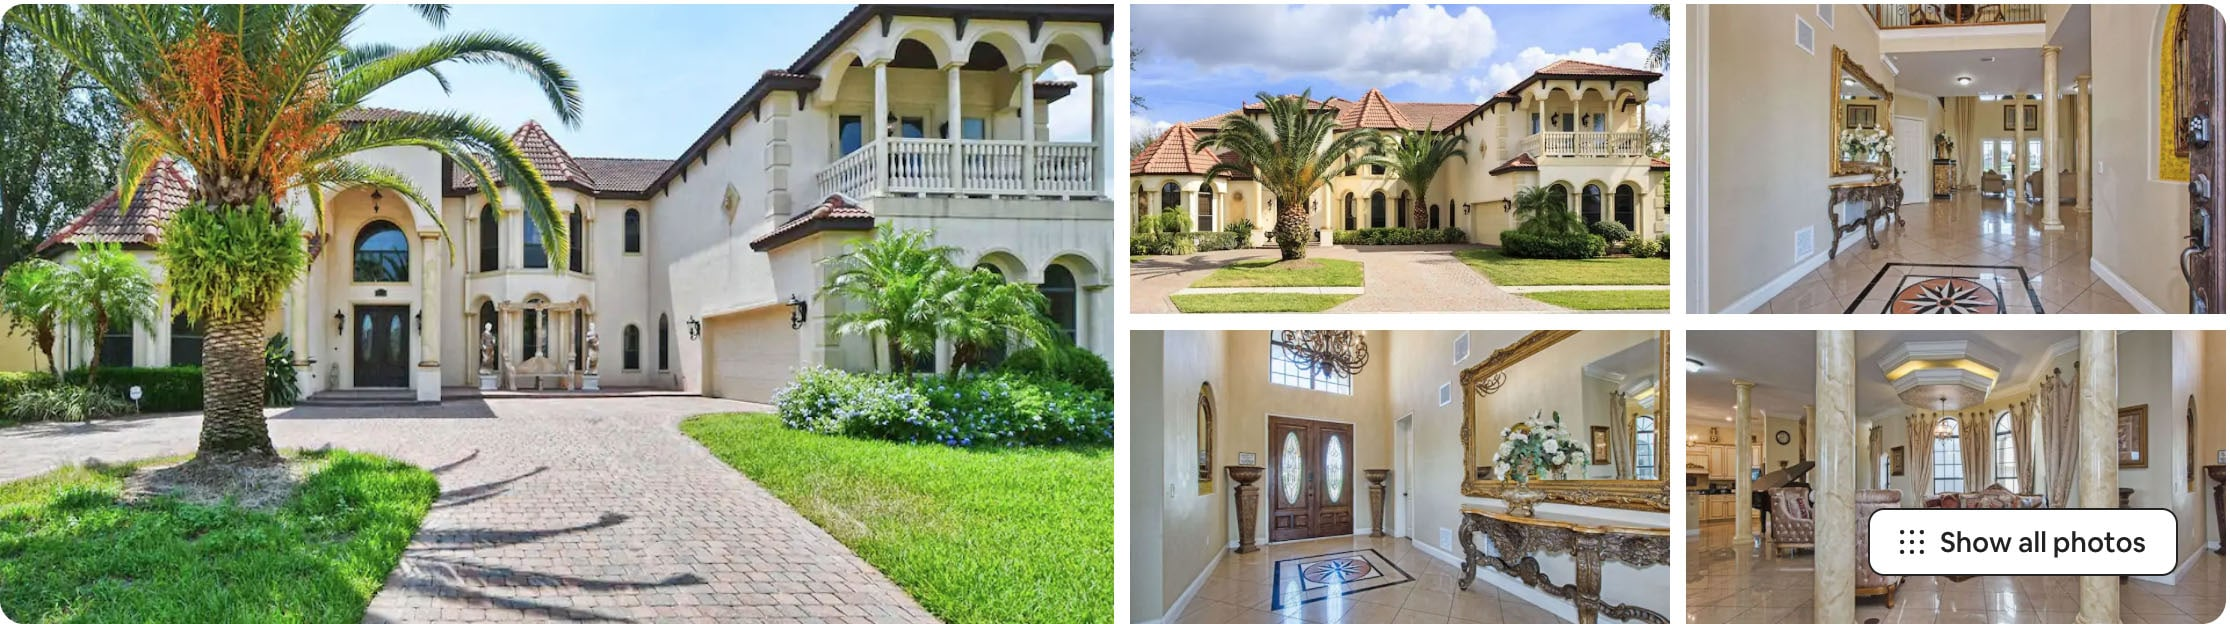 formosa grand mansion